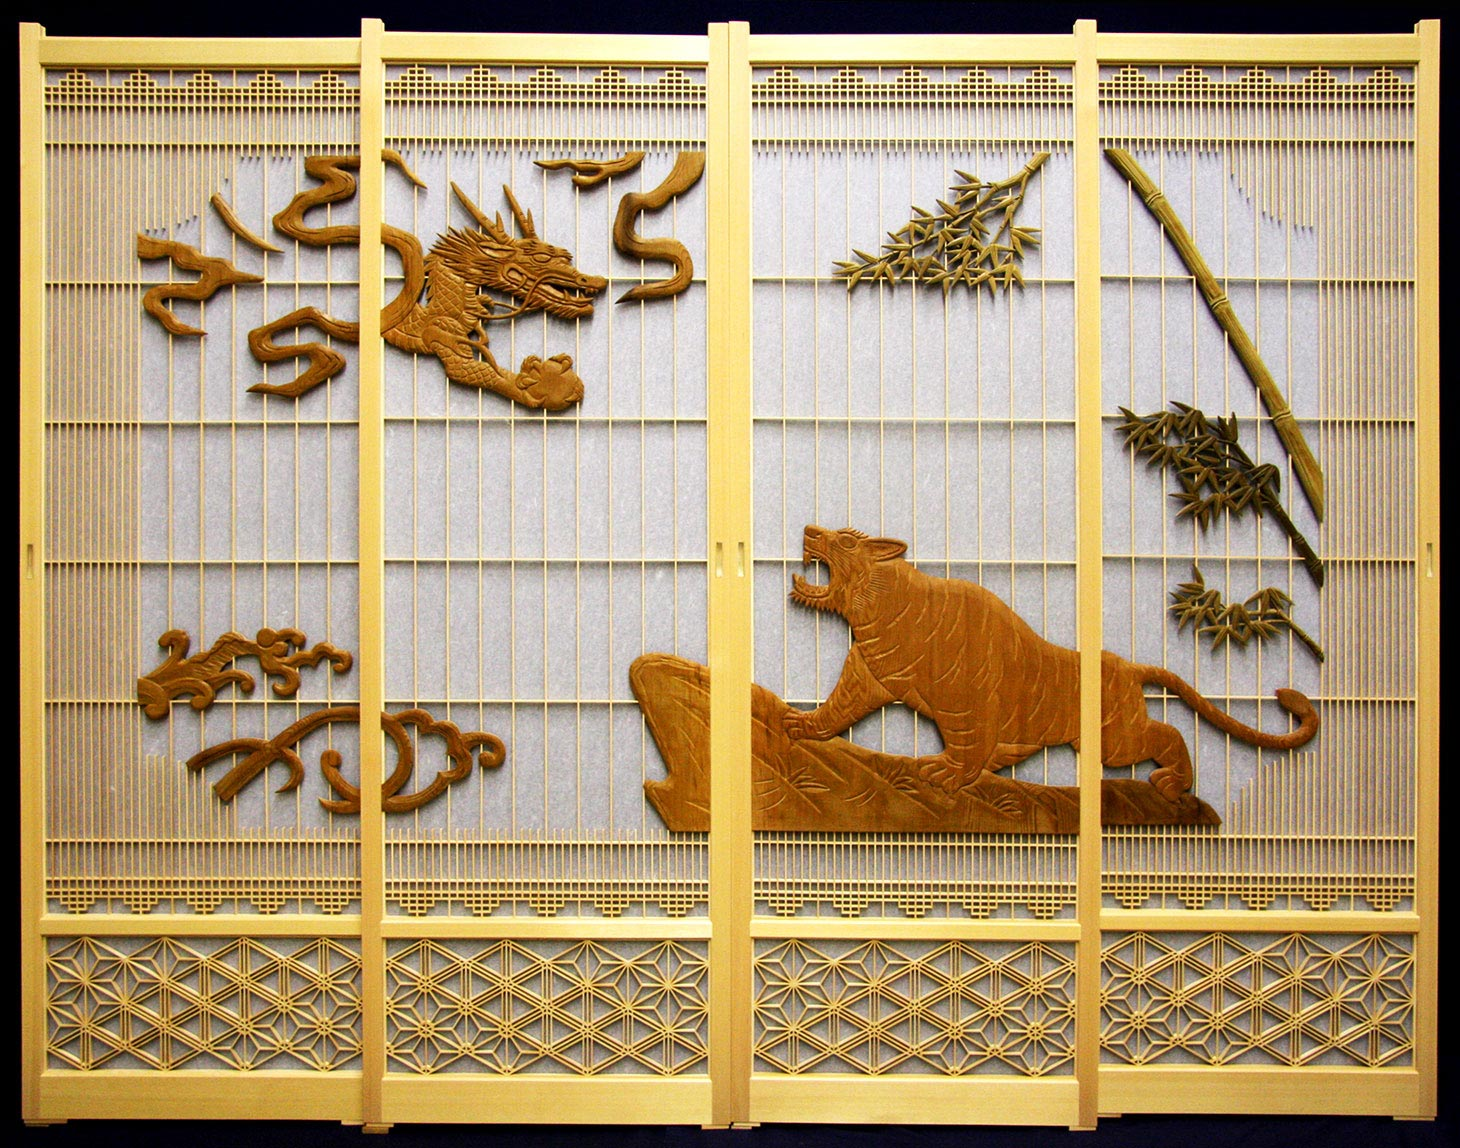 龍虎彫刻入飾り障子